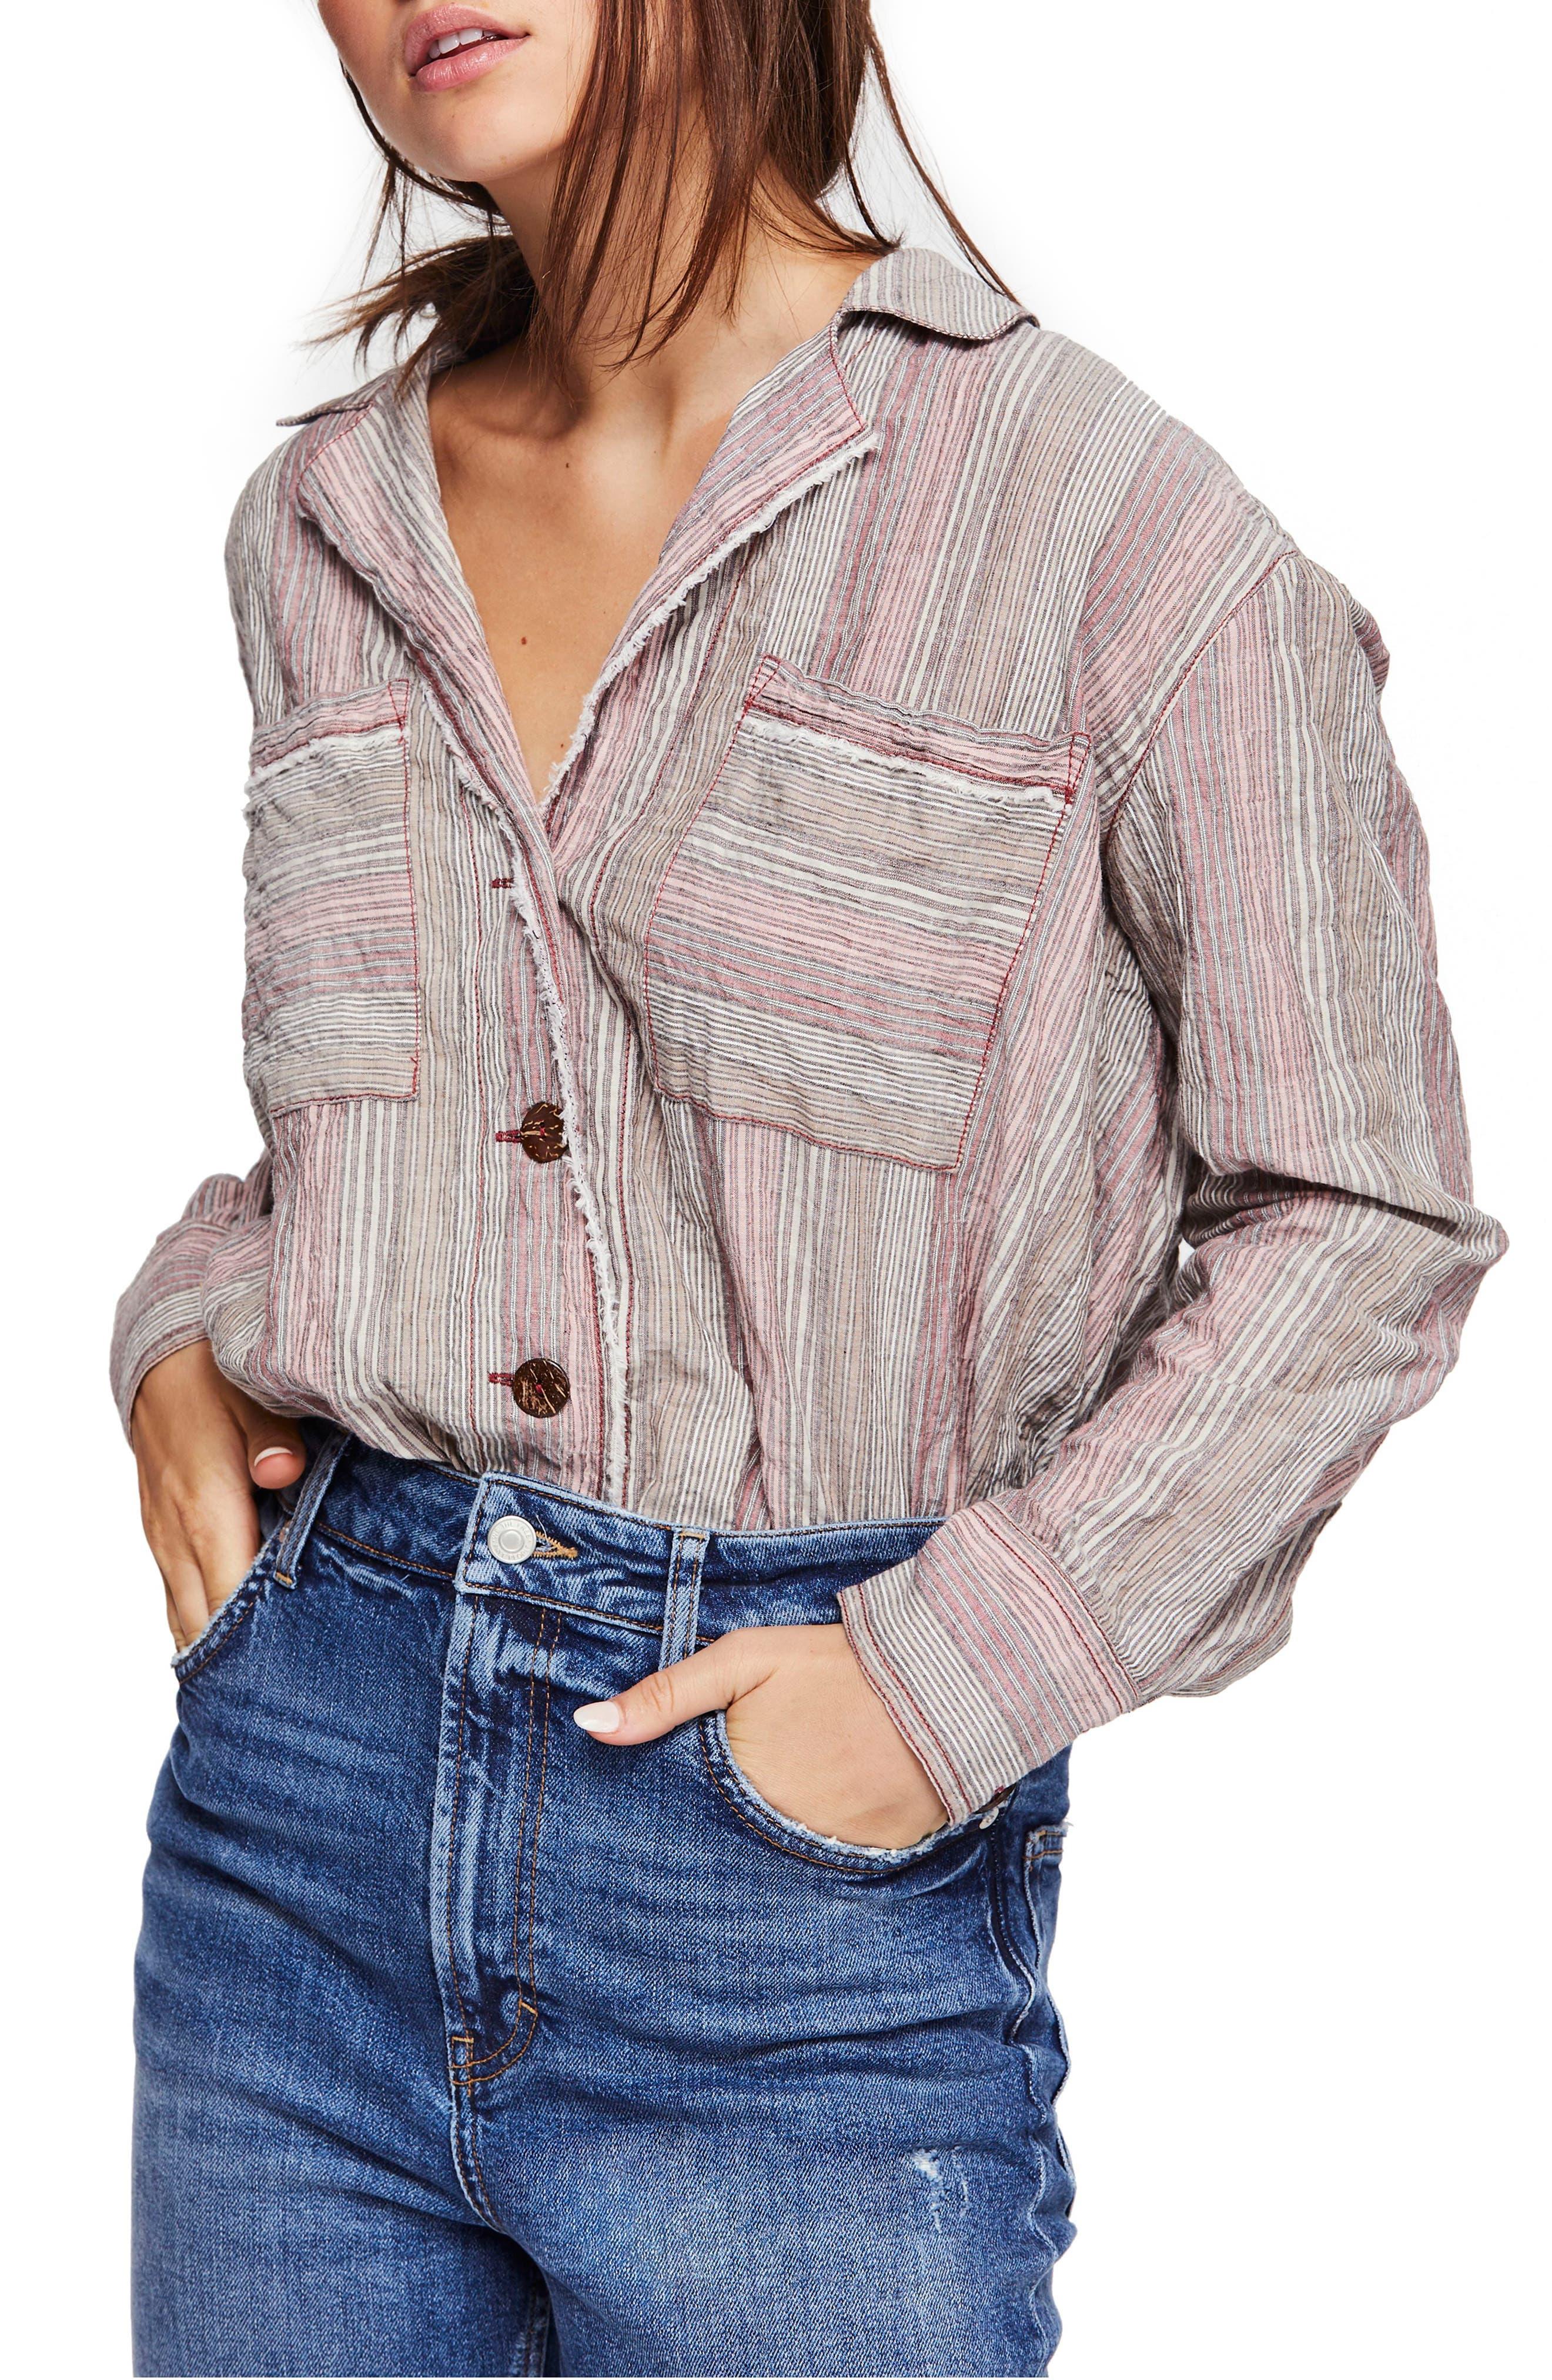 High Tide Multistripe Shirt, Main, color, SAND